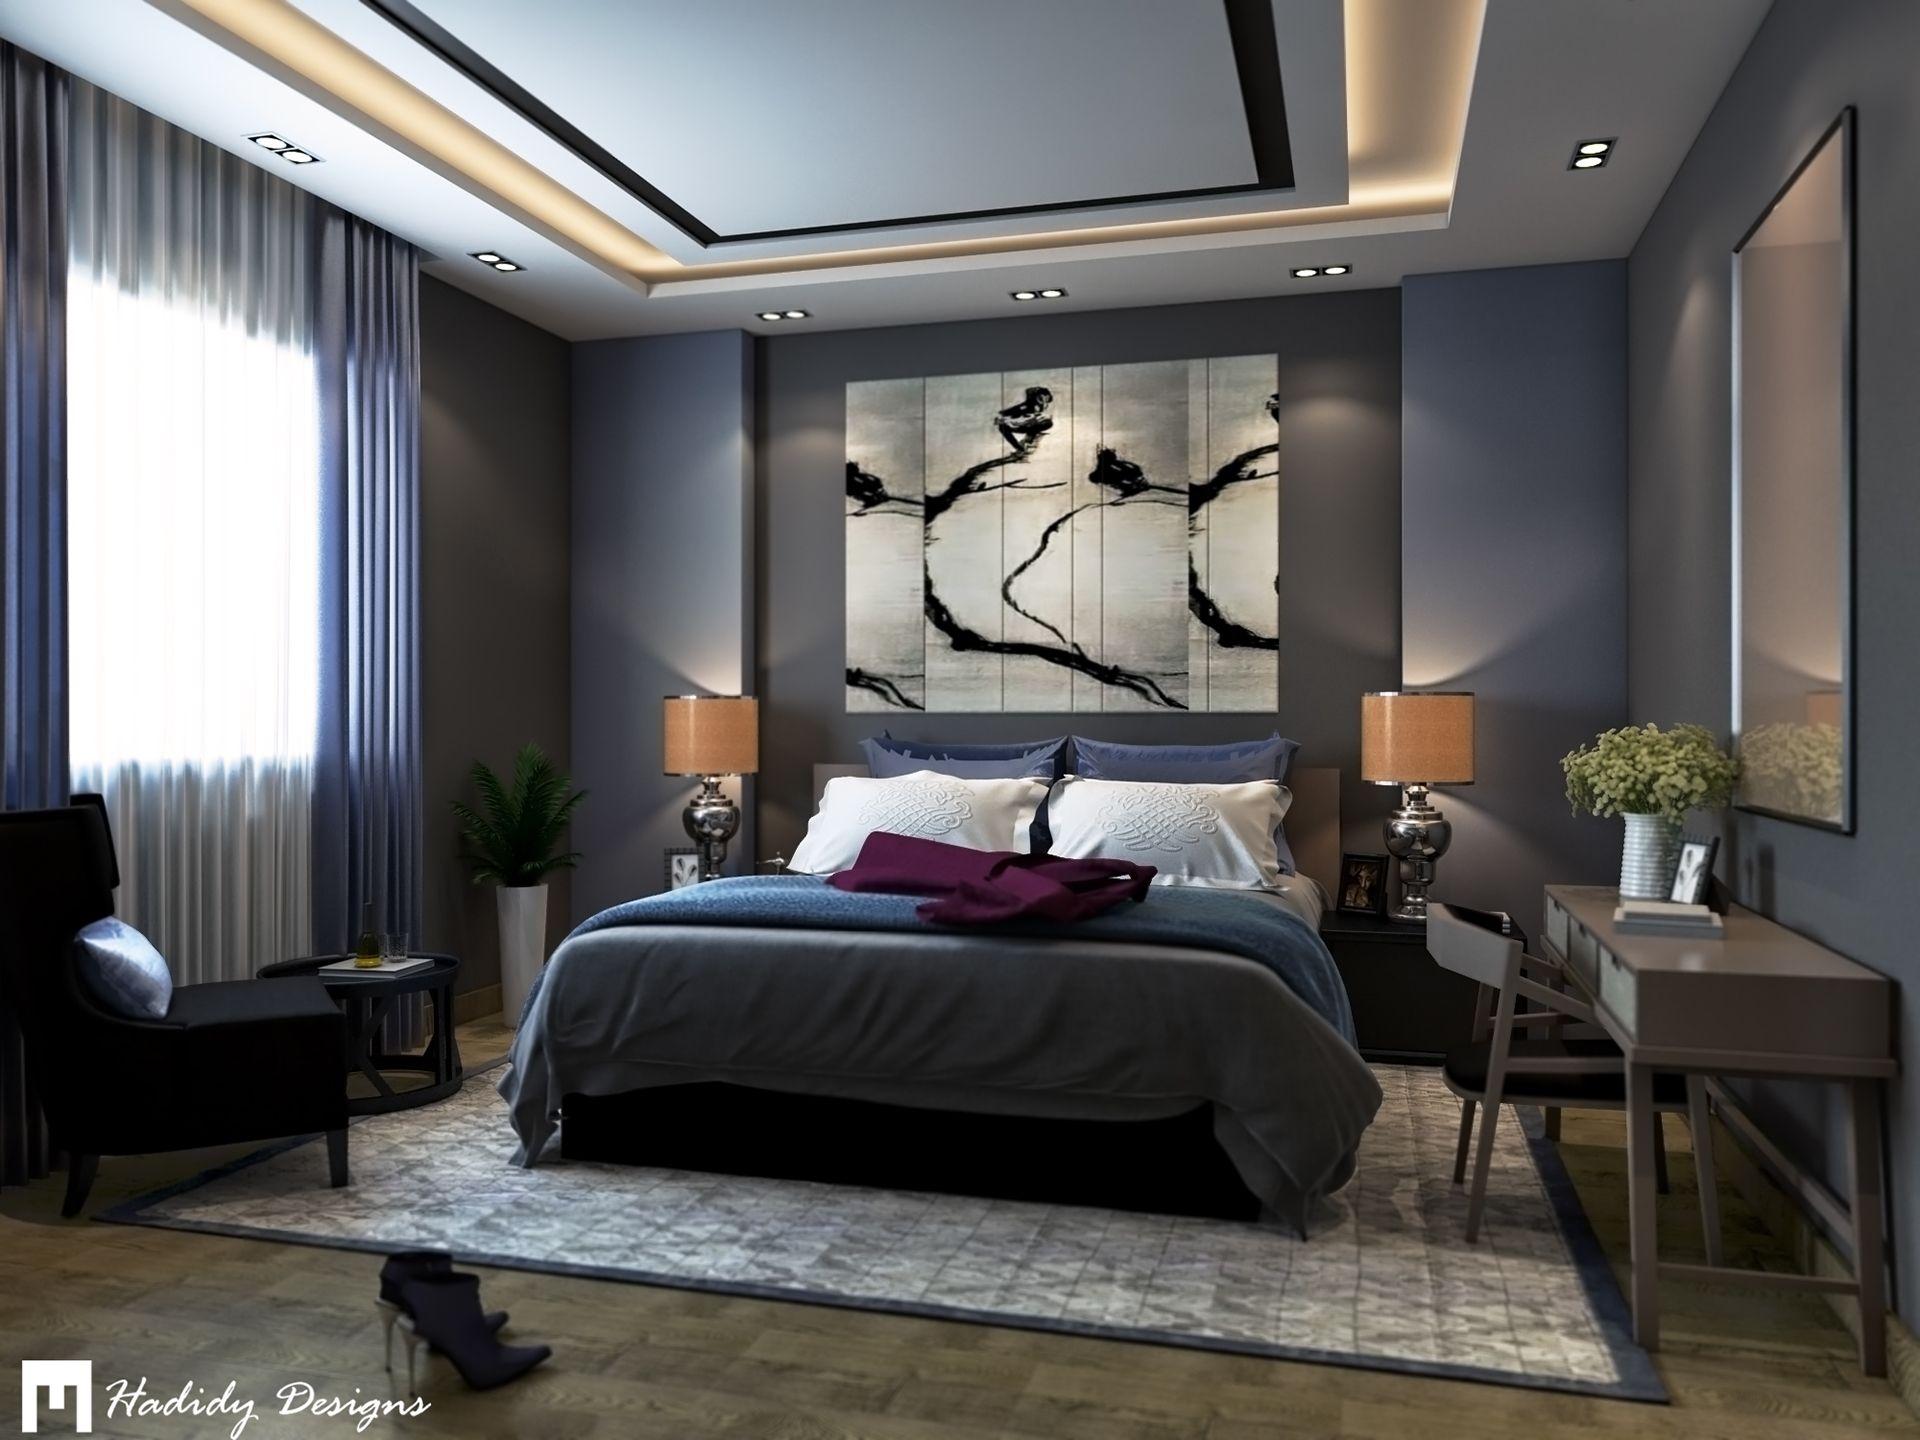 Villa Mardakan On Behance In 2021 Modern Master Bedroom Design Bedroom Interior Interior Design Bedroom